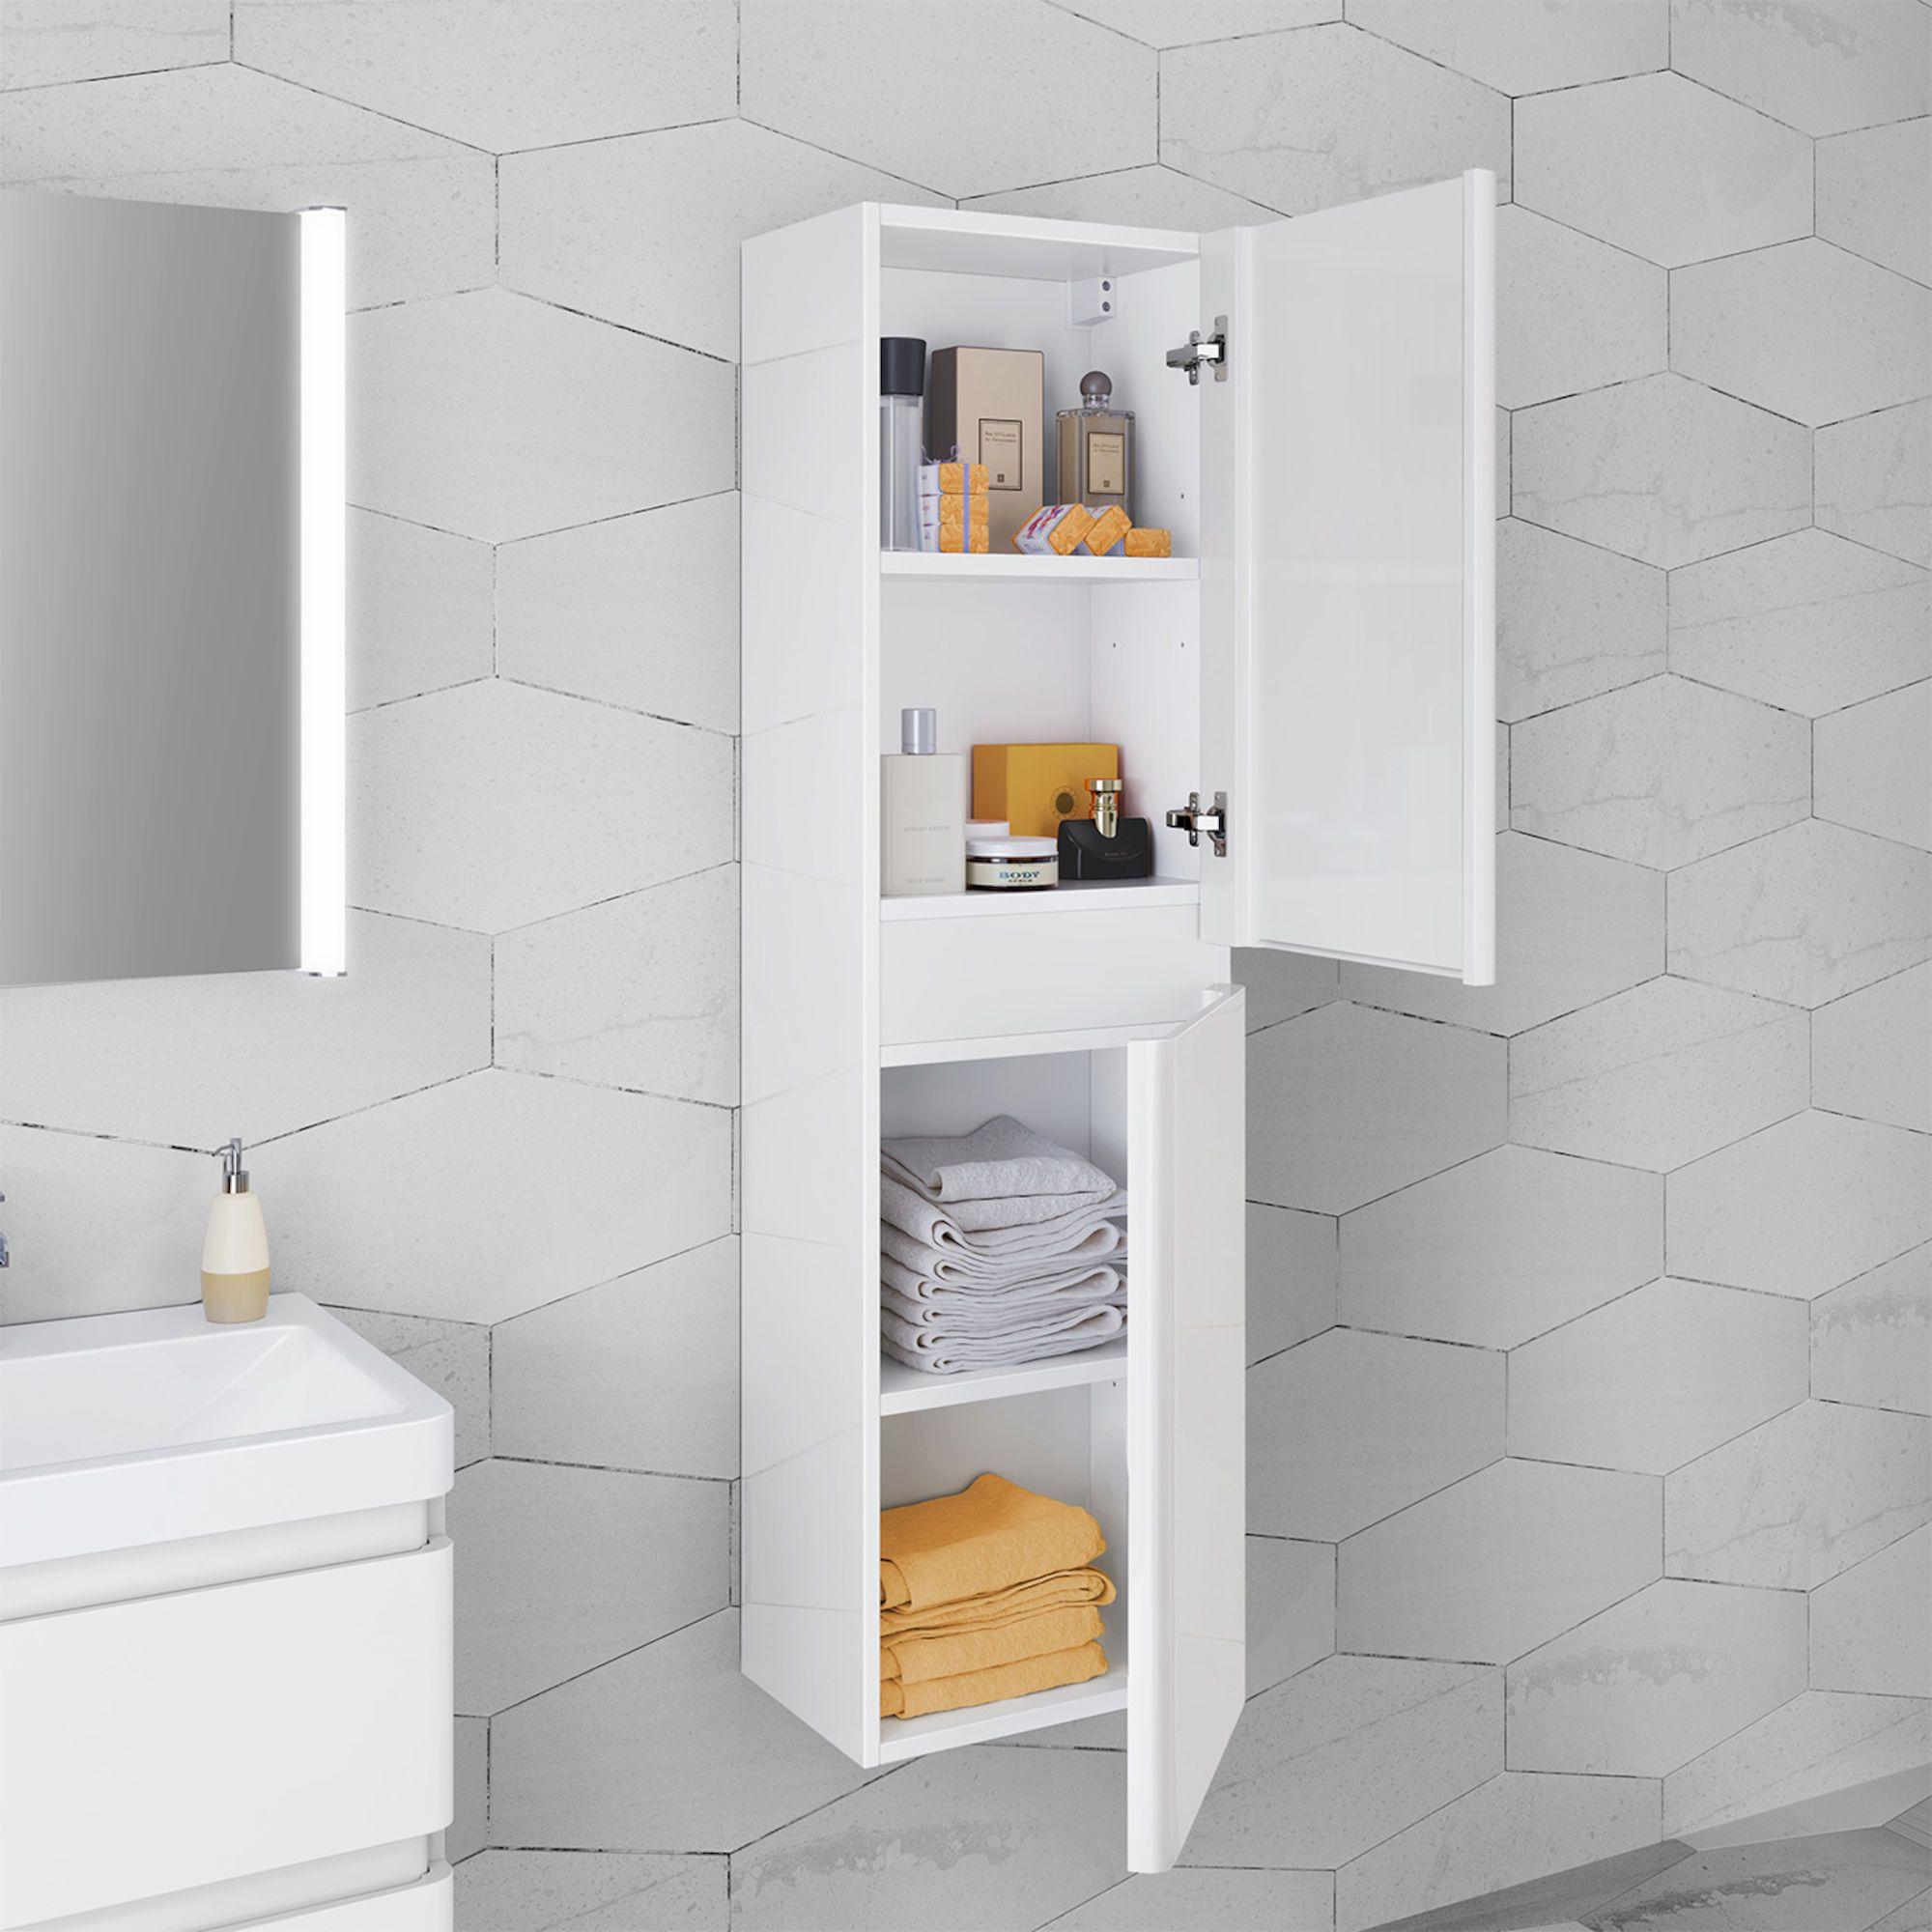 1400mm Denver Ii Gloss White Tall Storage Cabinet Wall Hung Diseno De Interiores De Bano Banos Interiores Decoracion De Interiores [ 2000 x 2000 Pixel ]